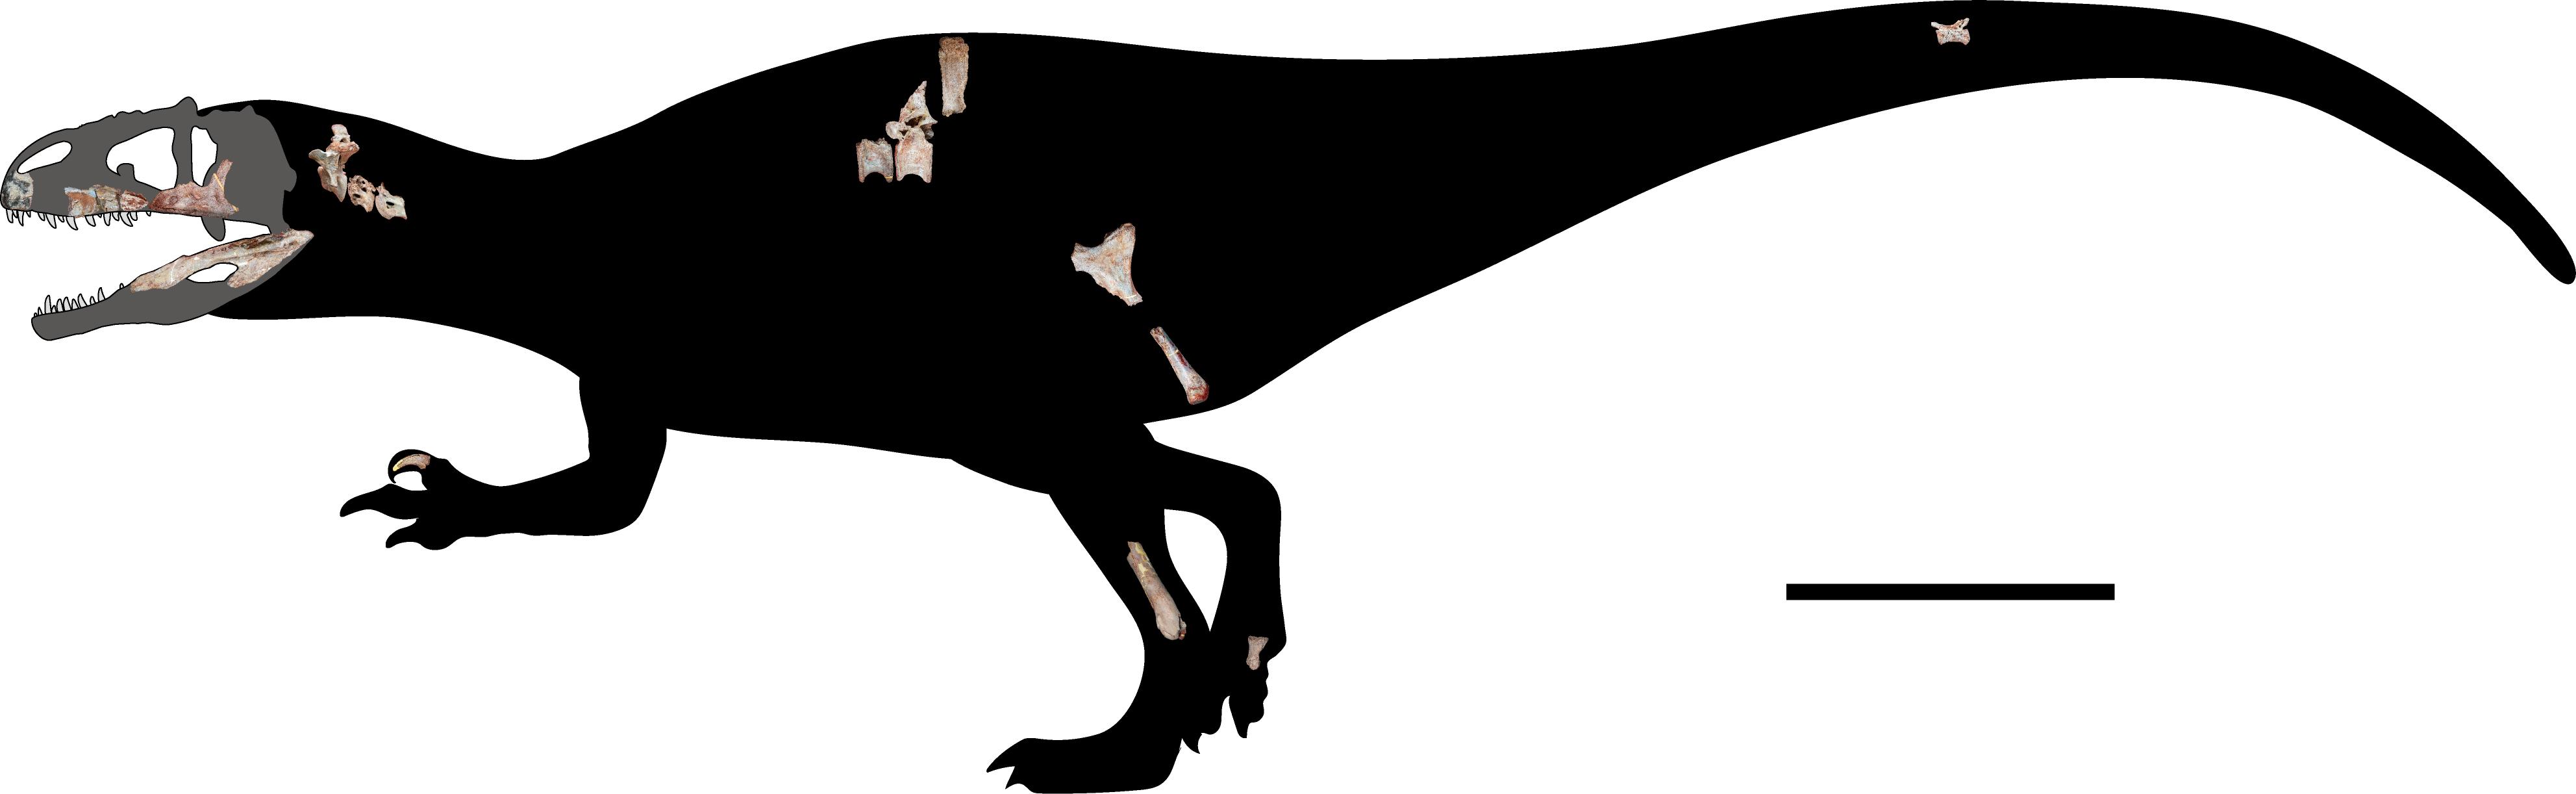 Siamraptor suwati reconstruction